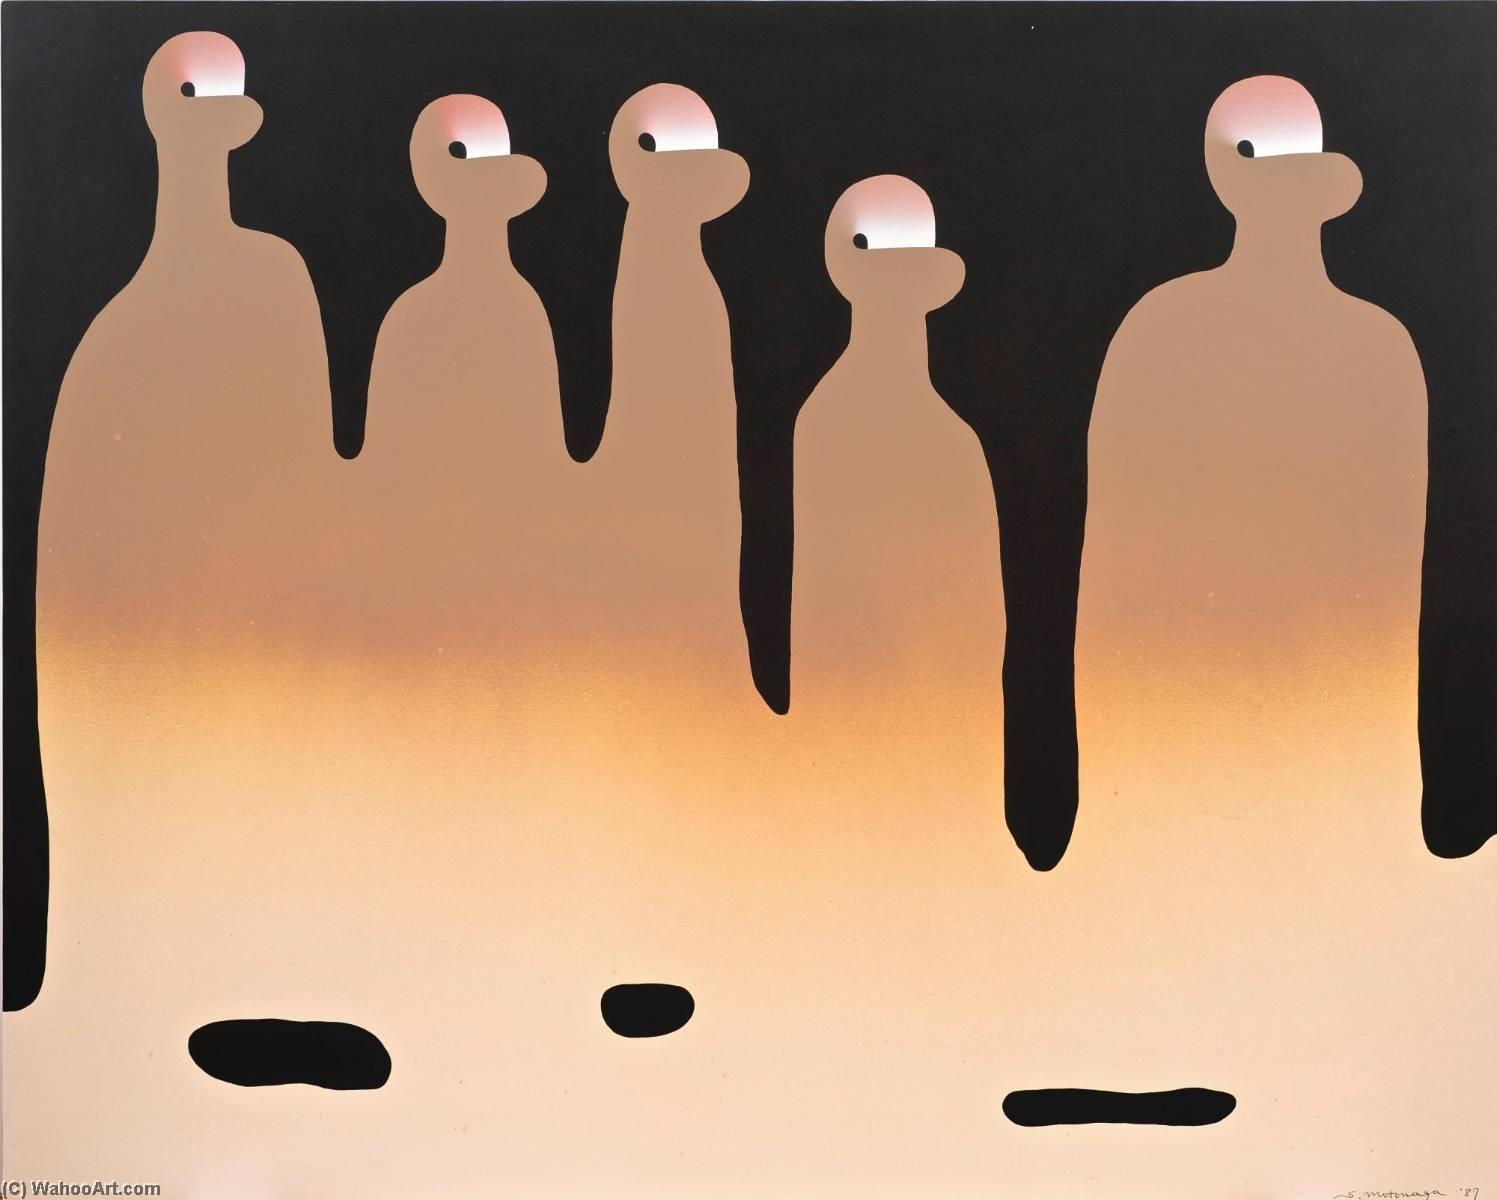 Wikioo.org - The Encyclopedia of Fine Arts - Painting, Artwork by Sadamasa Motonaga - Tsunagatteiru